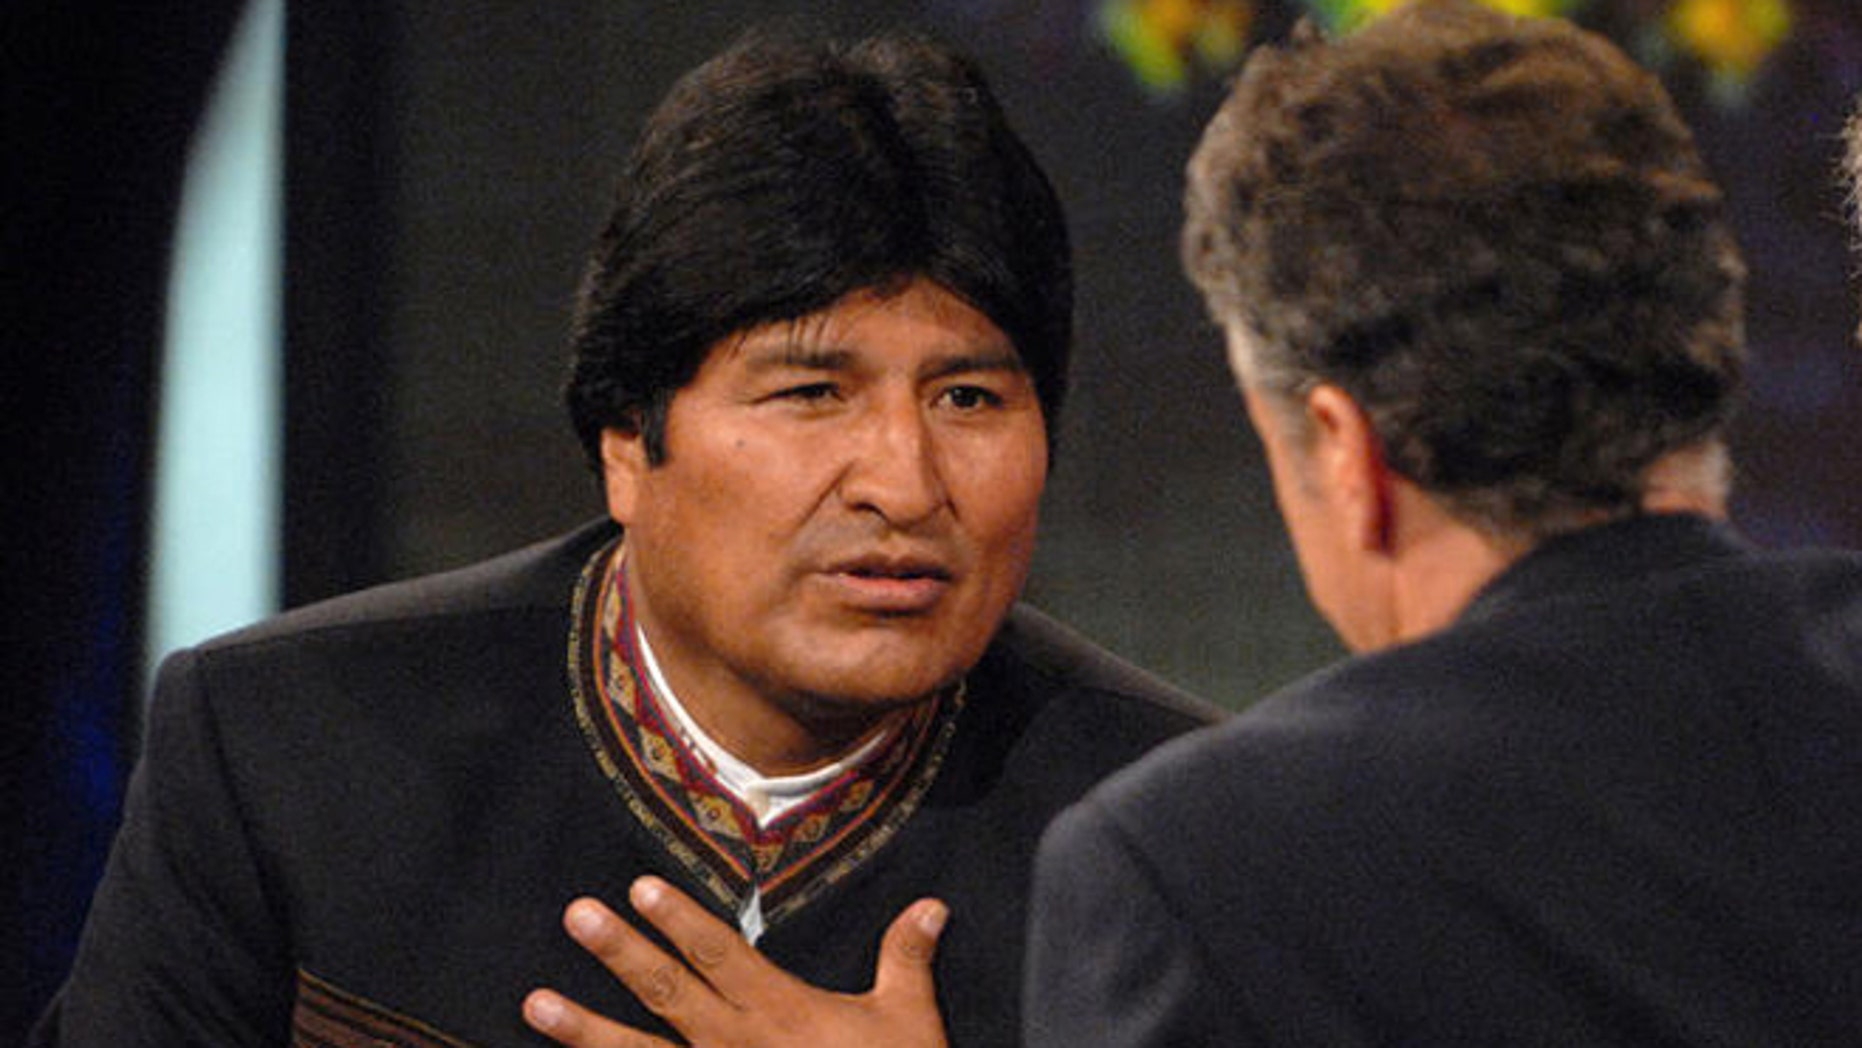 "Bolivian President Evo Morales, left, speaks with Daily Show host Jon Stewart, center, on Comedy Central's ""The Daily Show with Jon Stewart"" in New York, Tuesday Sept. 25, 2007. Morales's translator is seen at right. (AP Photo/Peter Kramer)"